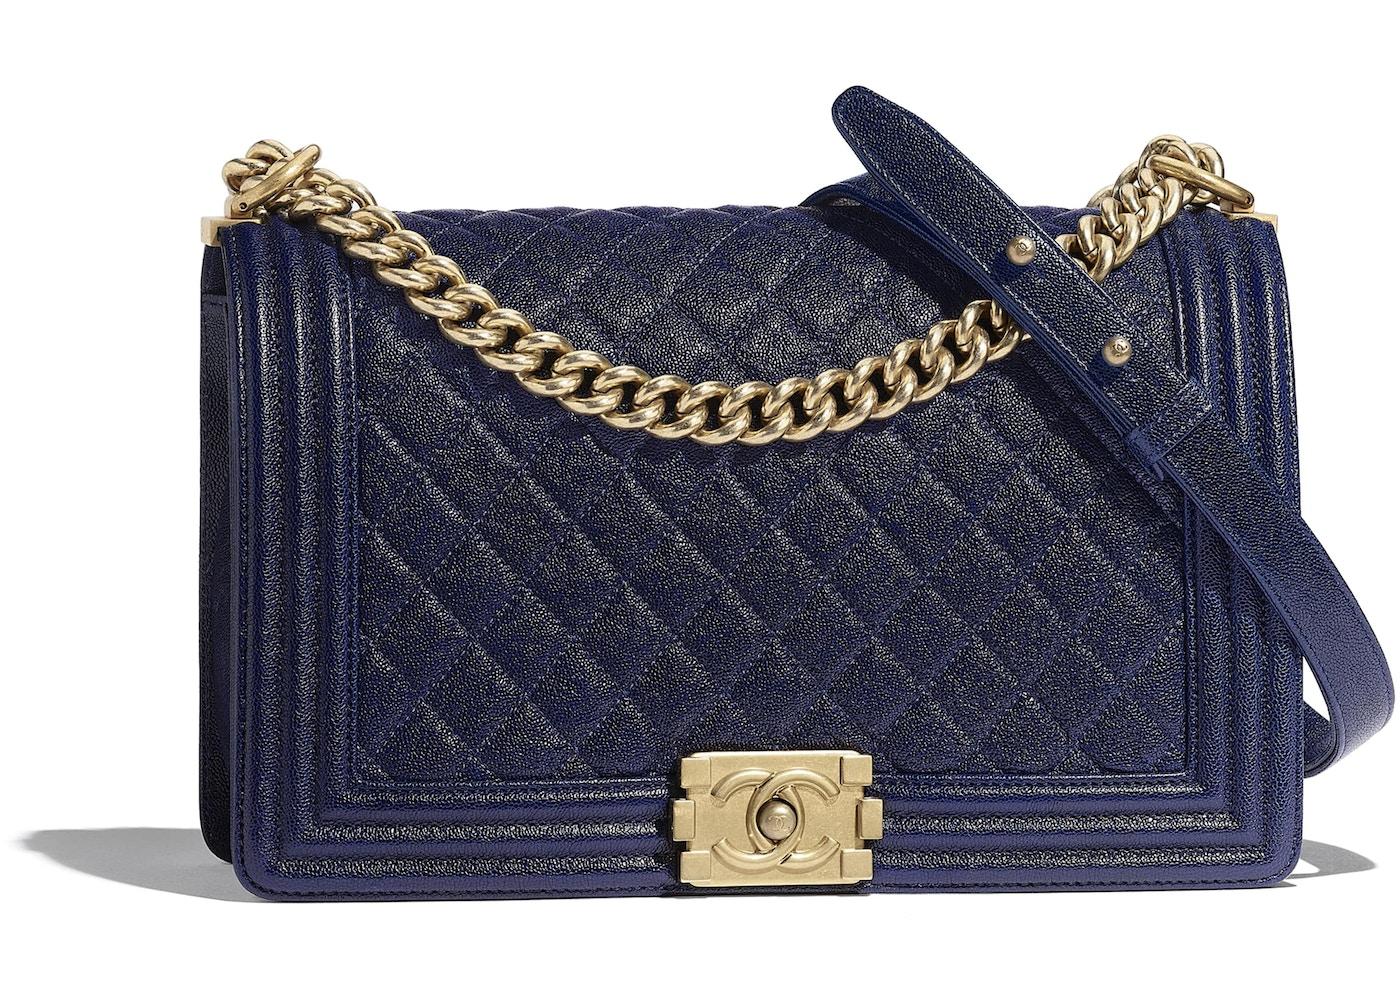 c6f2bc6ec236 Buy   Sell Chanel Boy Handbags